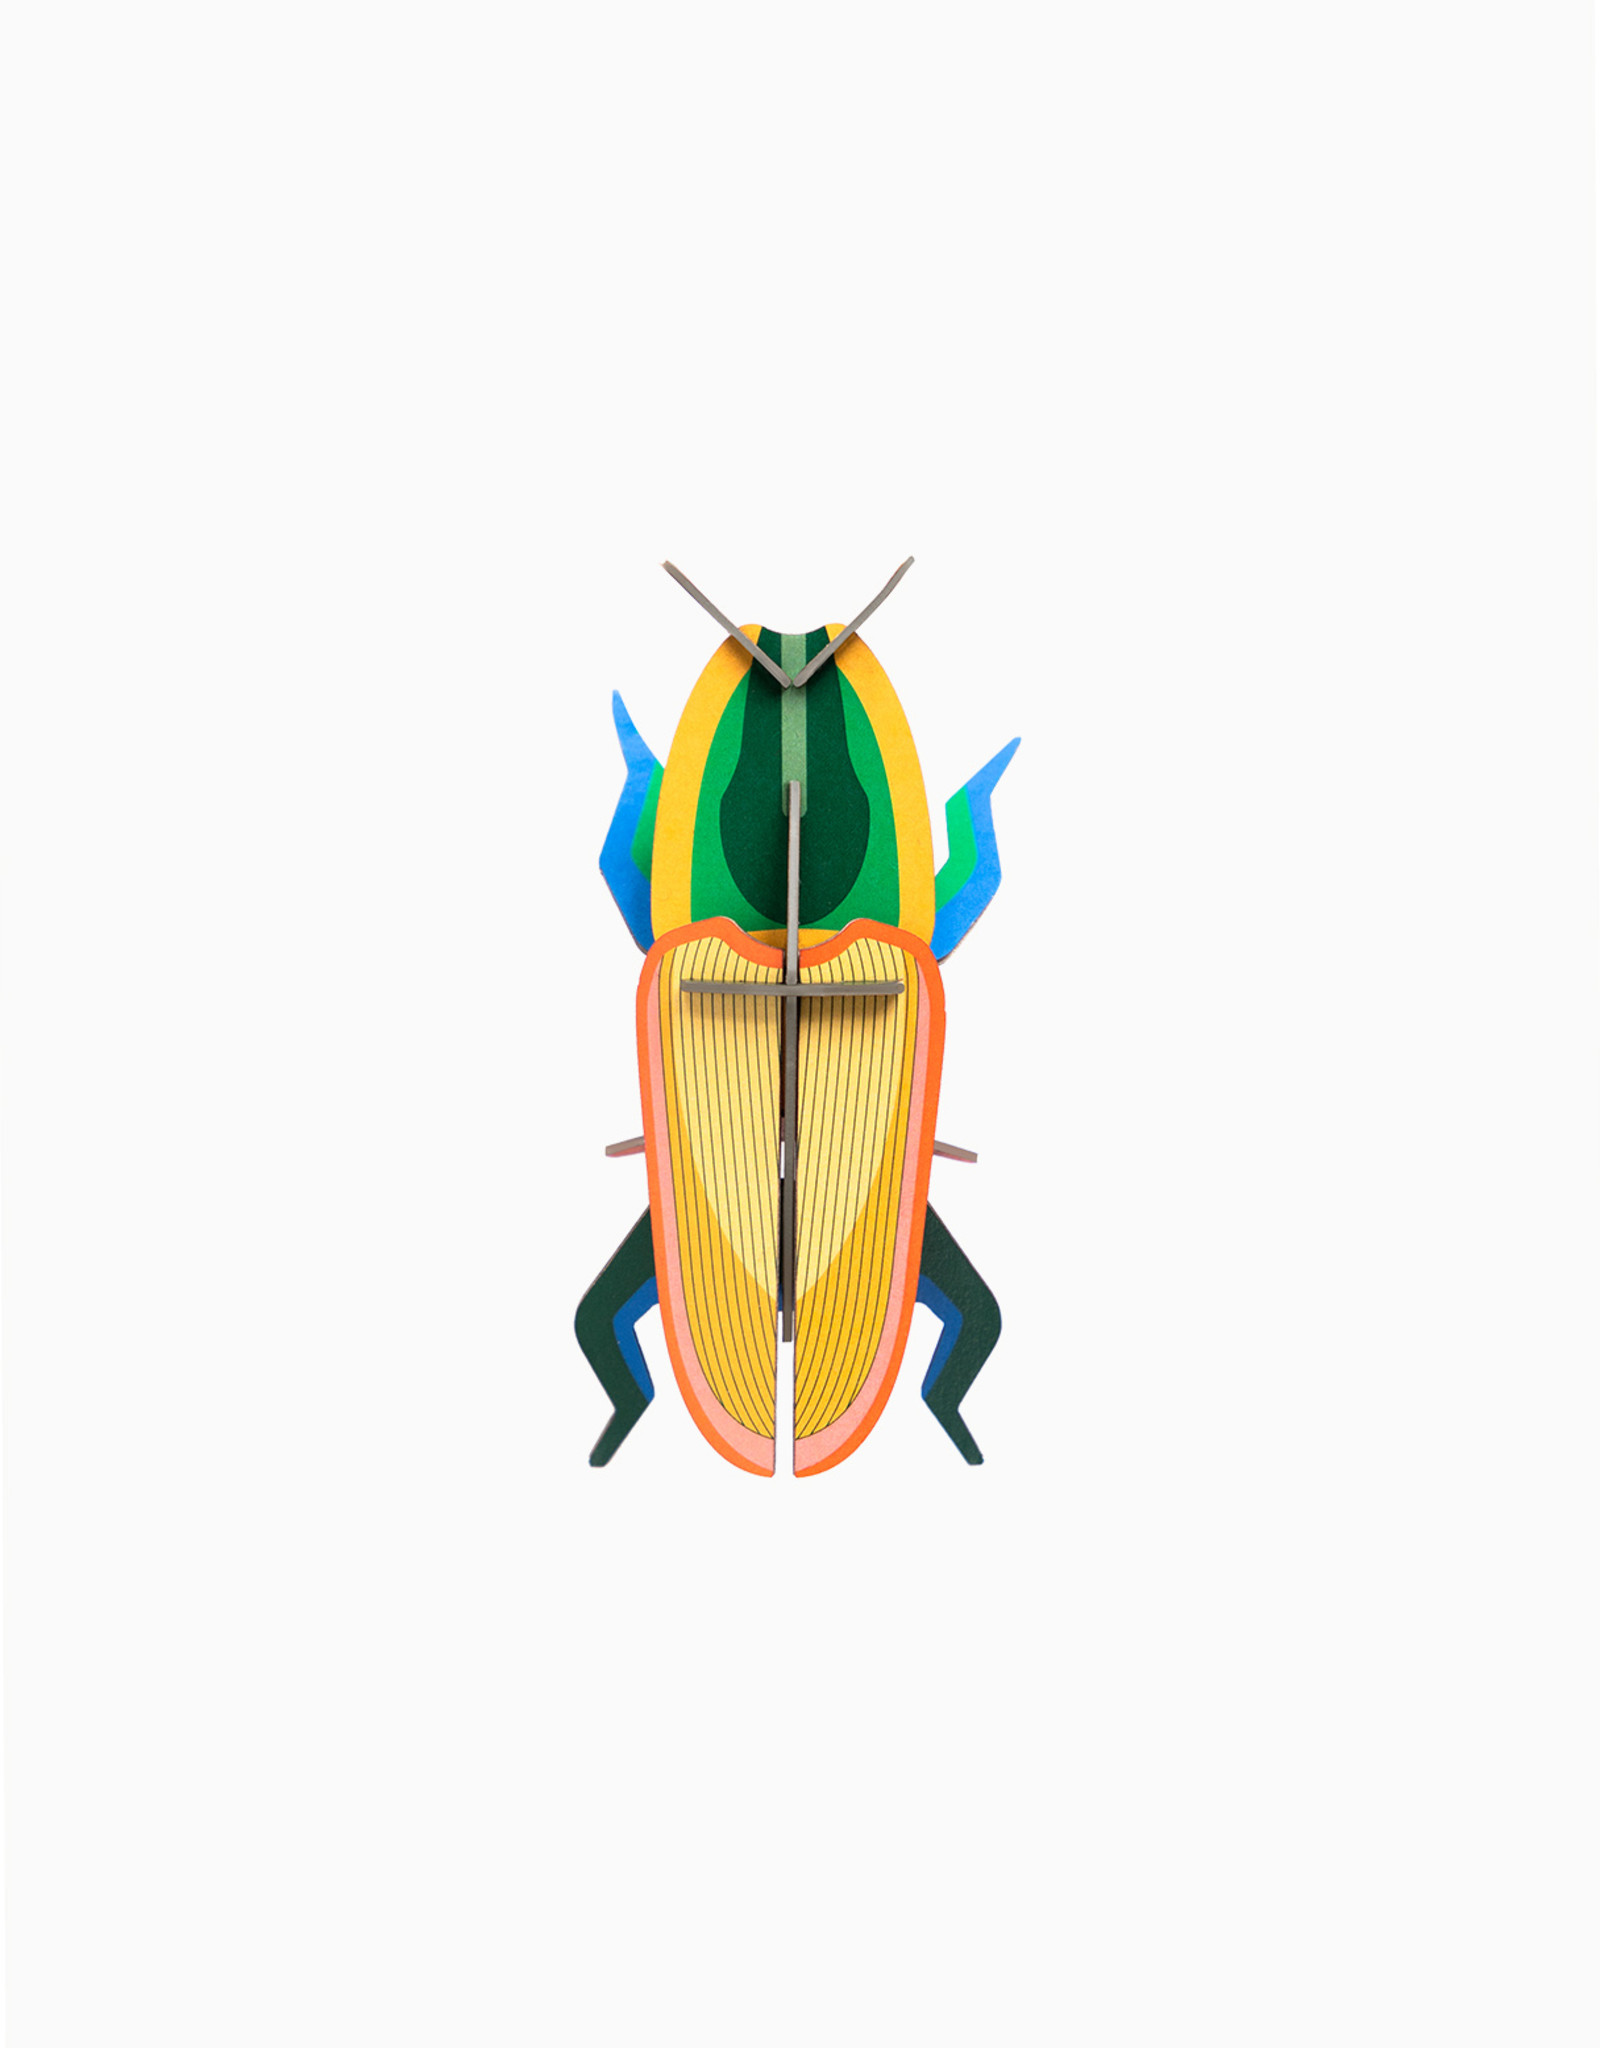 Studioroof Wall Decor Madagascar Beetle (small)